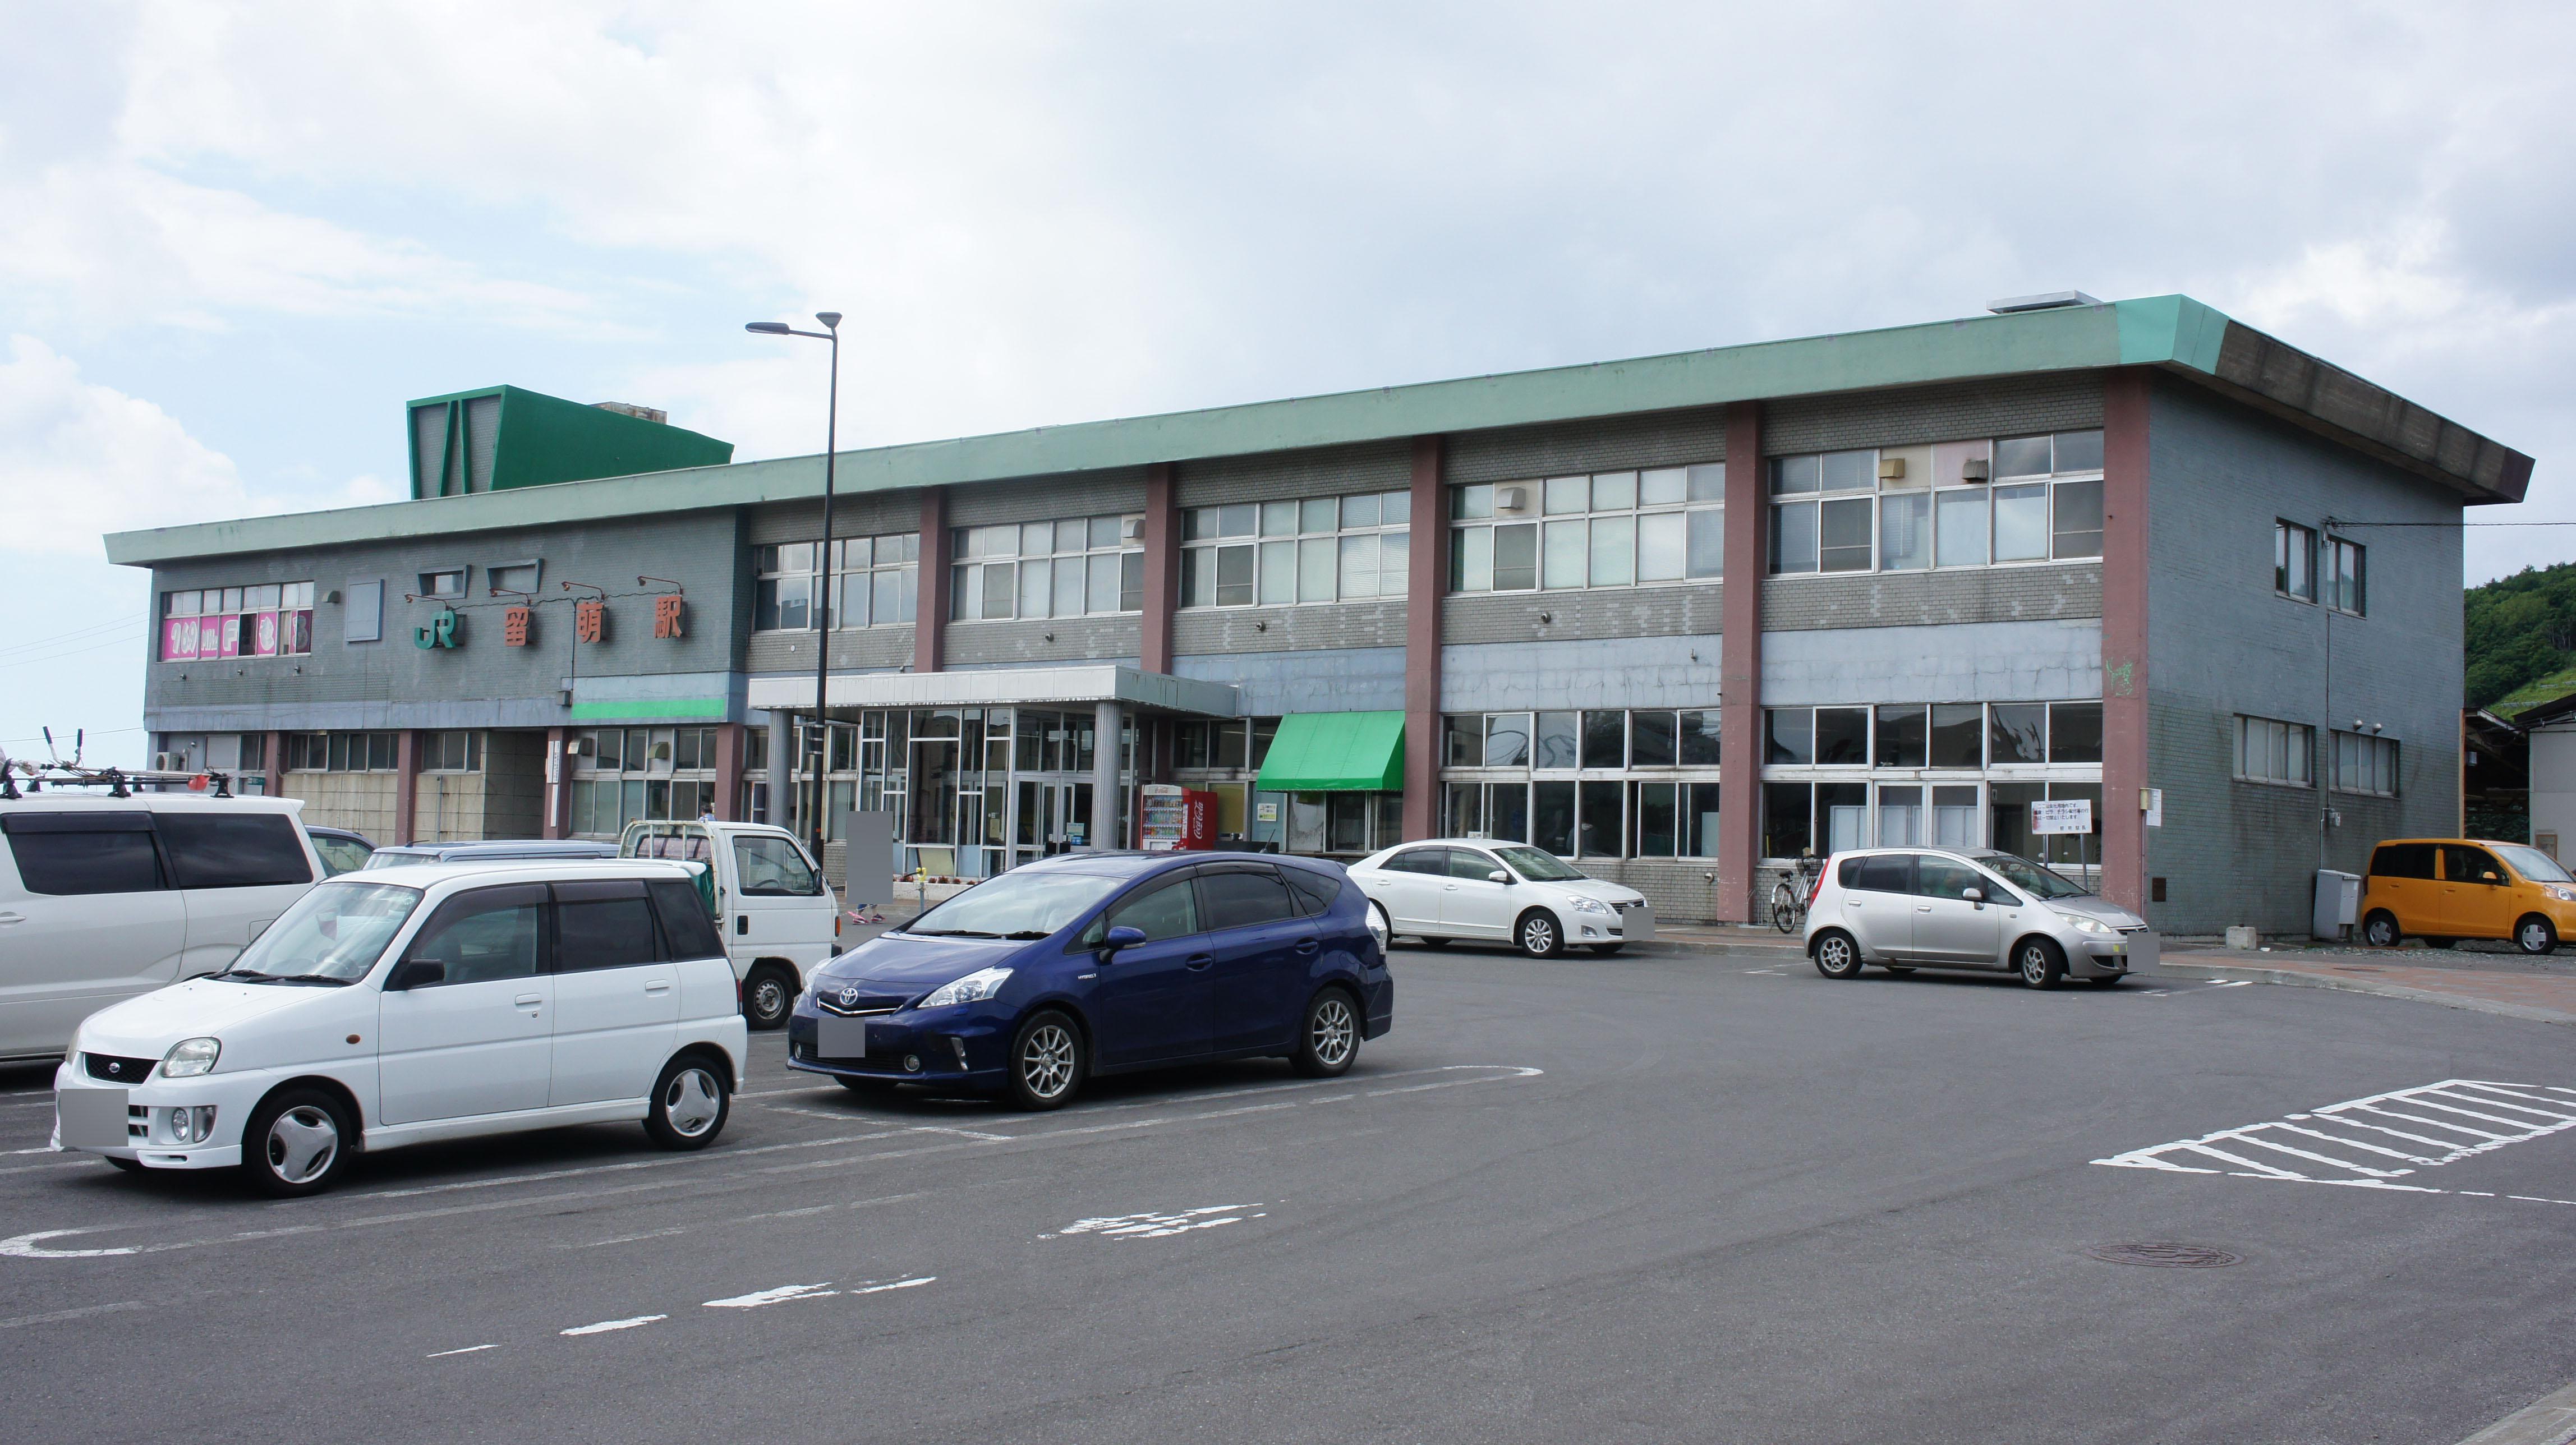 https://upload.wikimedia.org/wikipedia/commons/6/6f/JR_Rumoi-Main-Line_Rumoi_Station_building.jpg